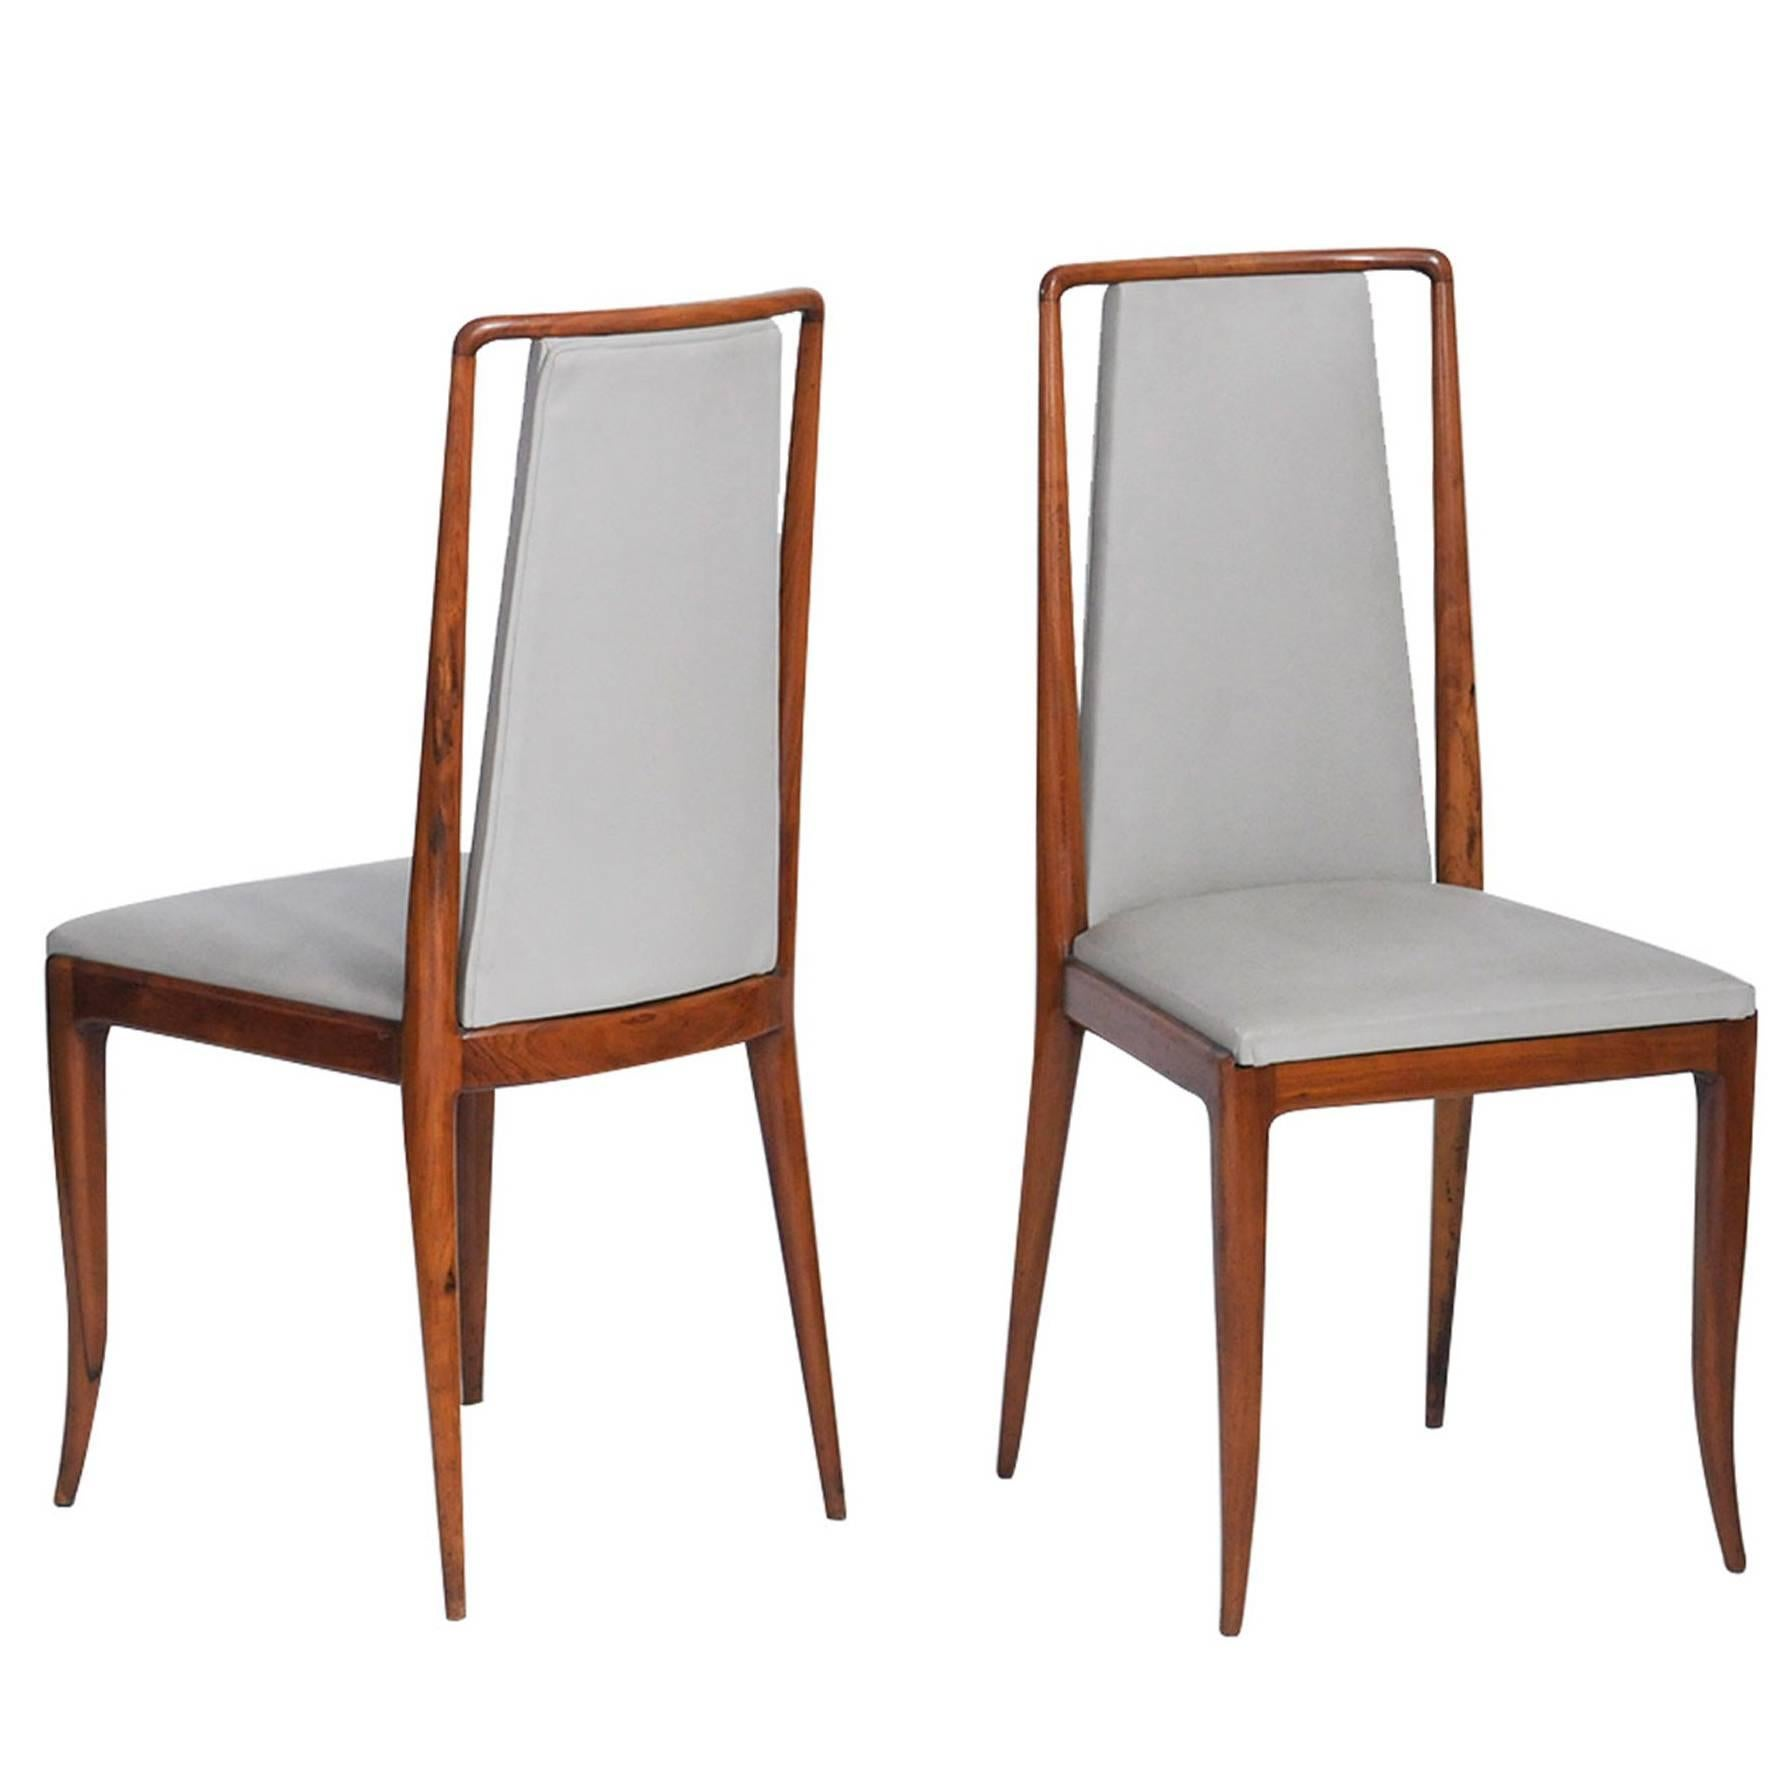 Giuseppe Scapinelli Midcentury brazilian Chair in Caviuna, 1950s